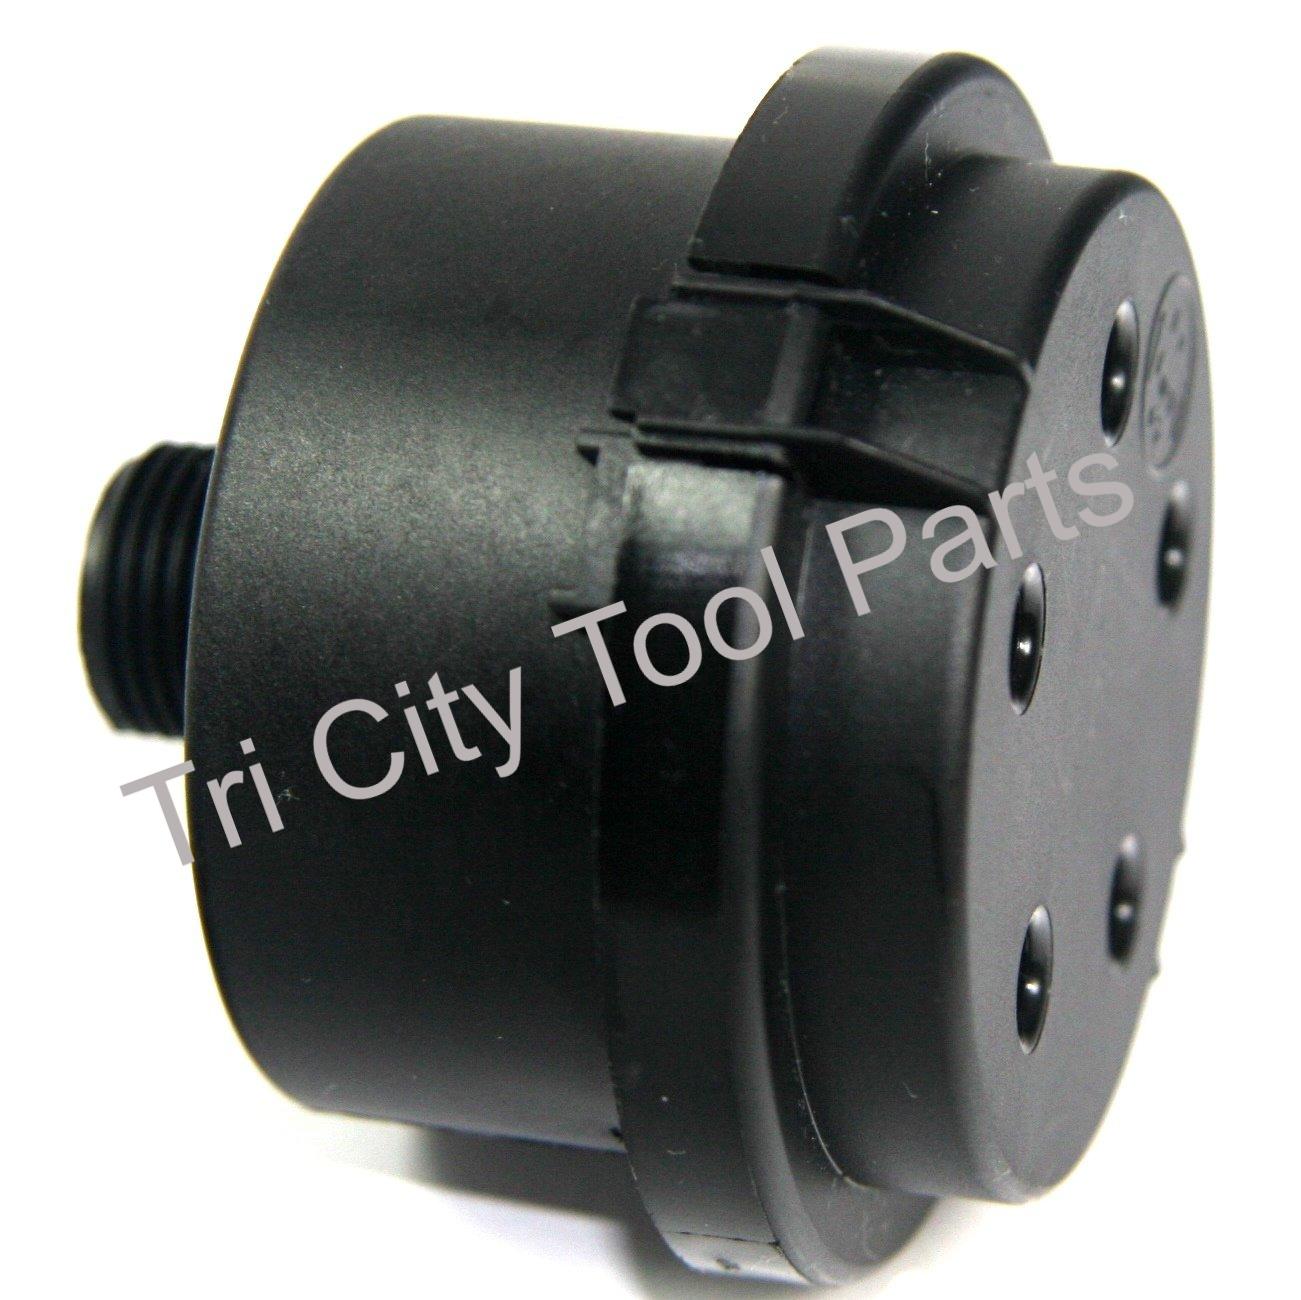 N022307 tricitym-r N022307 DeWalt Air Compressor Air Filter  Replaces D24345 & D24263  ** OEM **